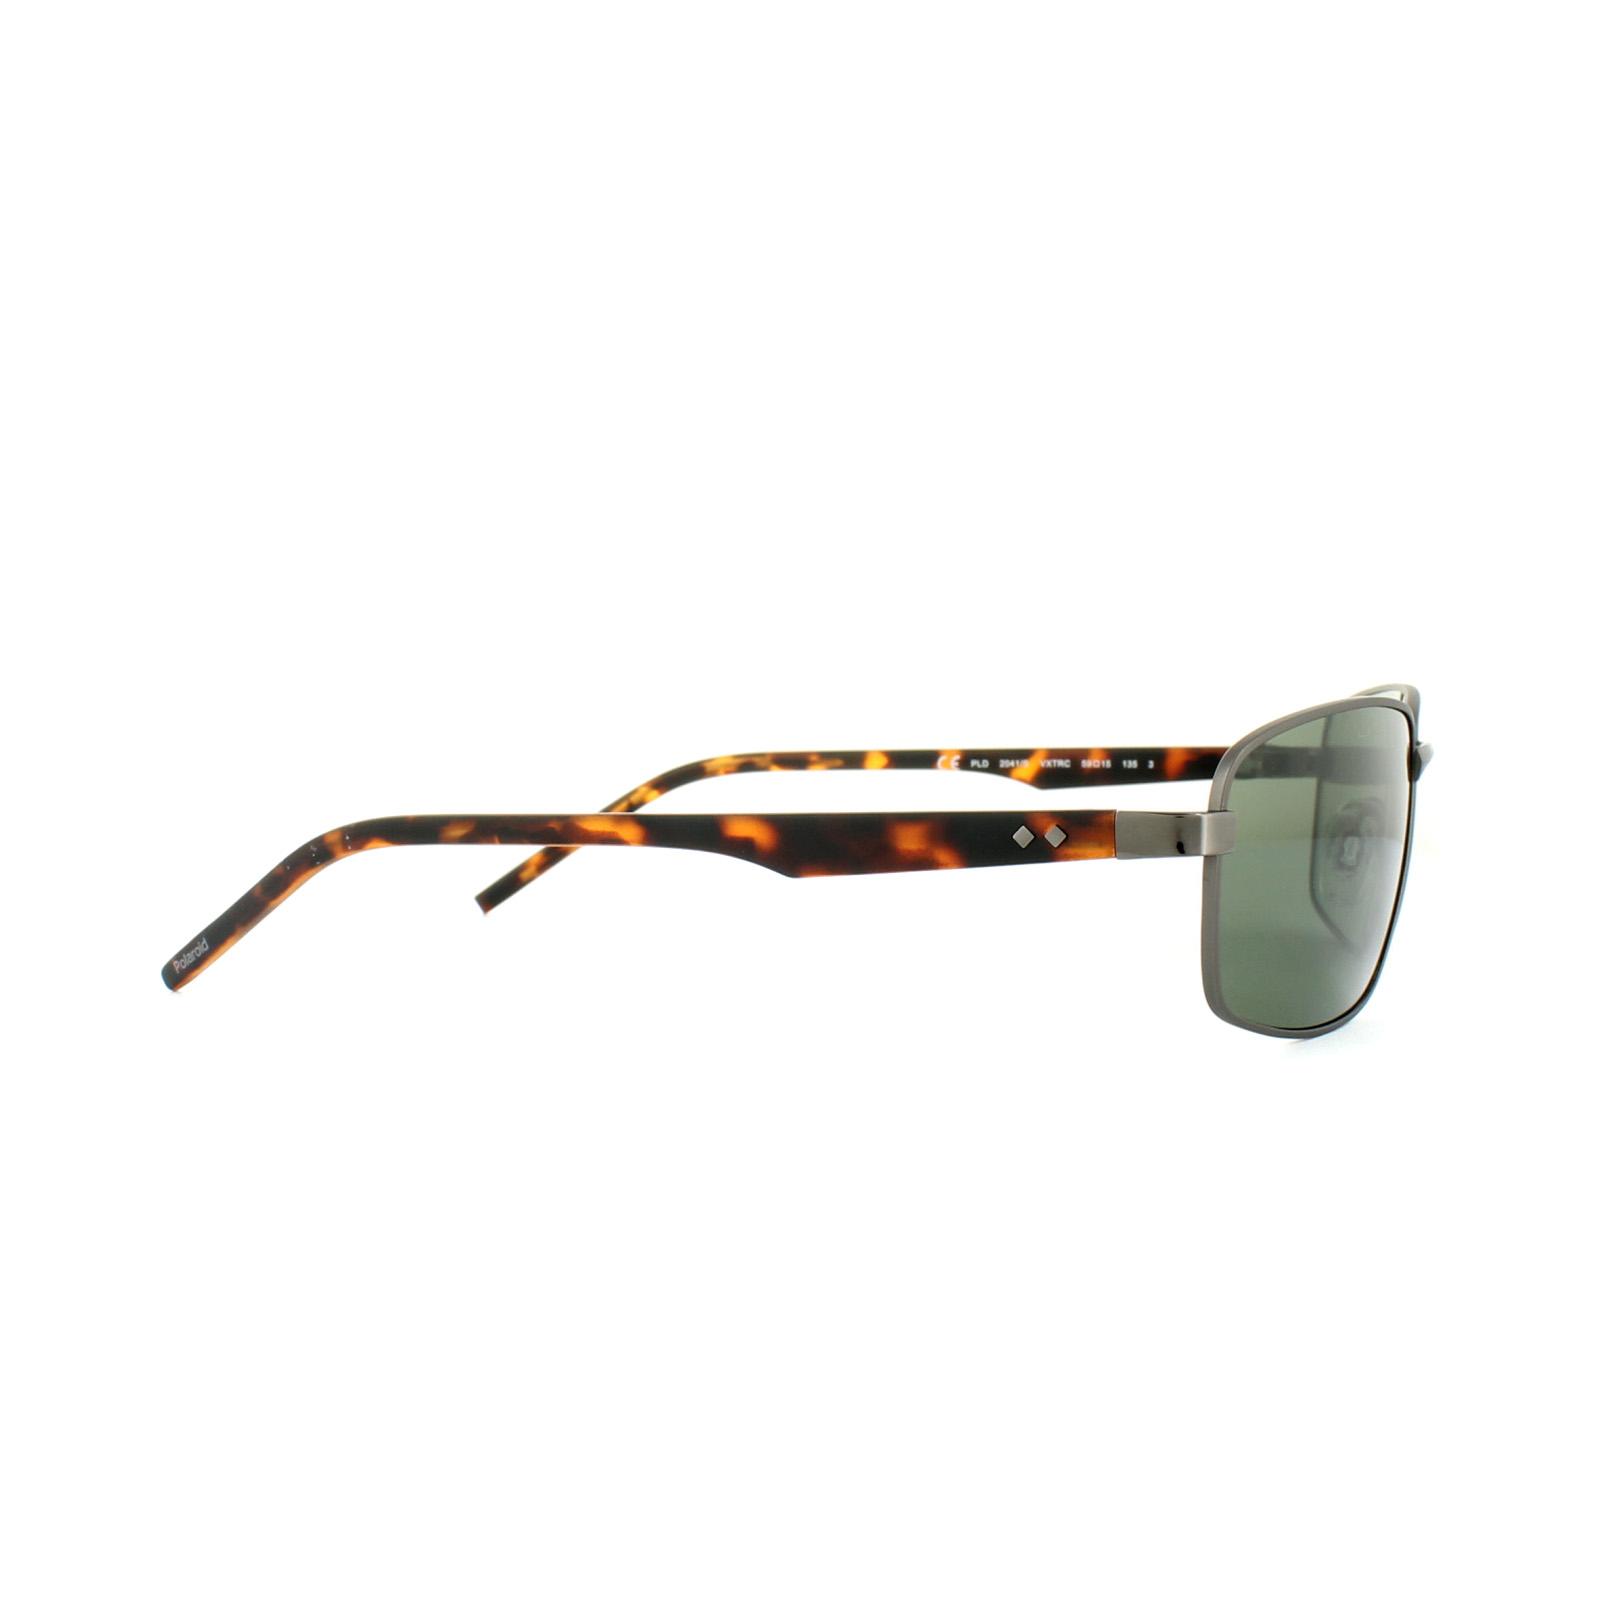 28cfff240c Sentinel Polaroid Sunglasses PLD 2041 S VXT RC Silver Havana Green Polarized